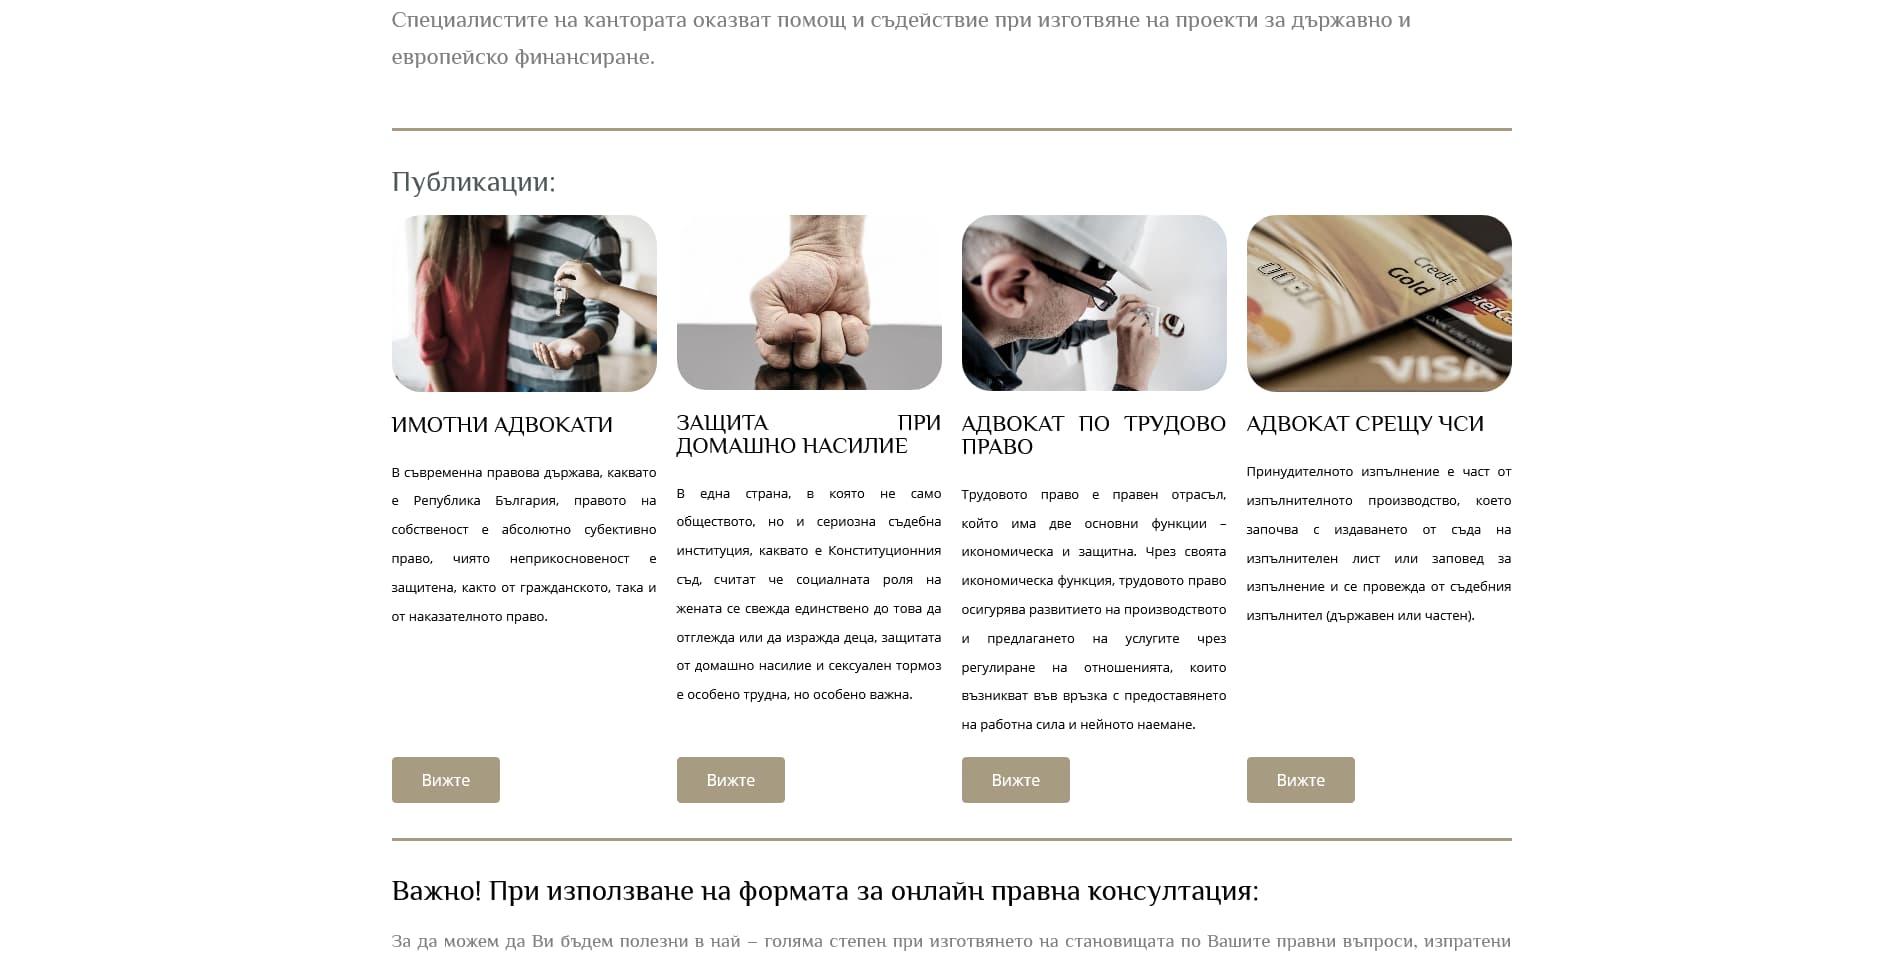 адвокатска-кантора-уебсайт